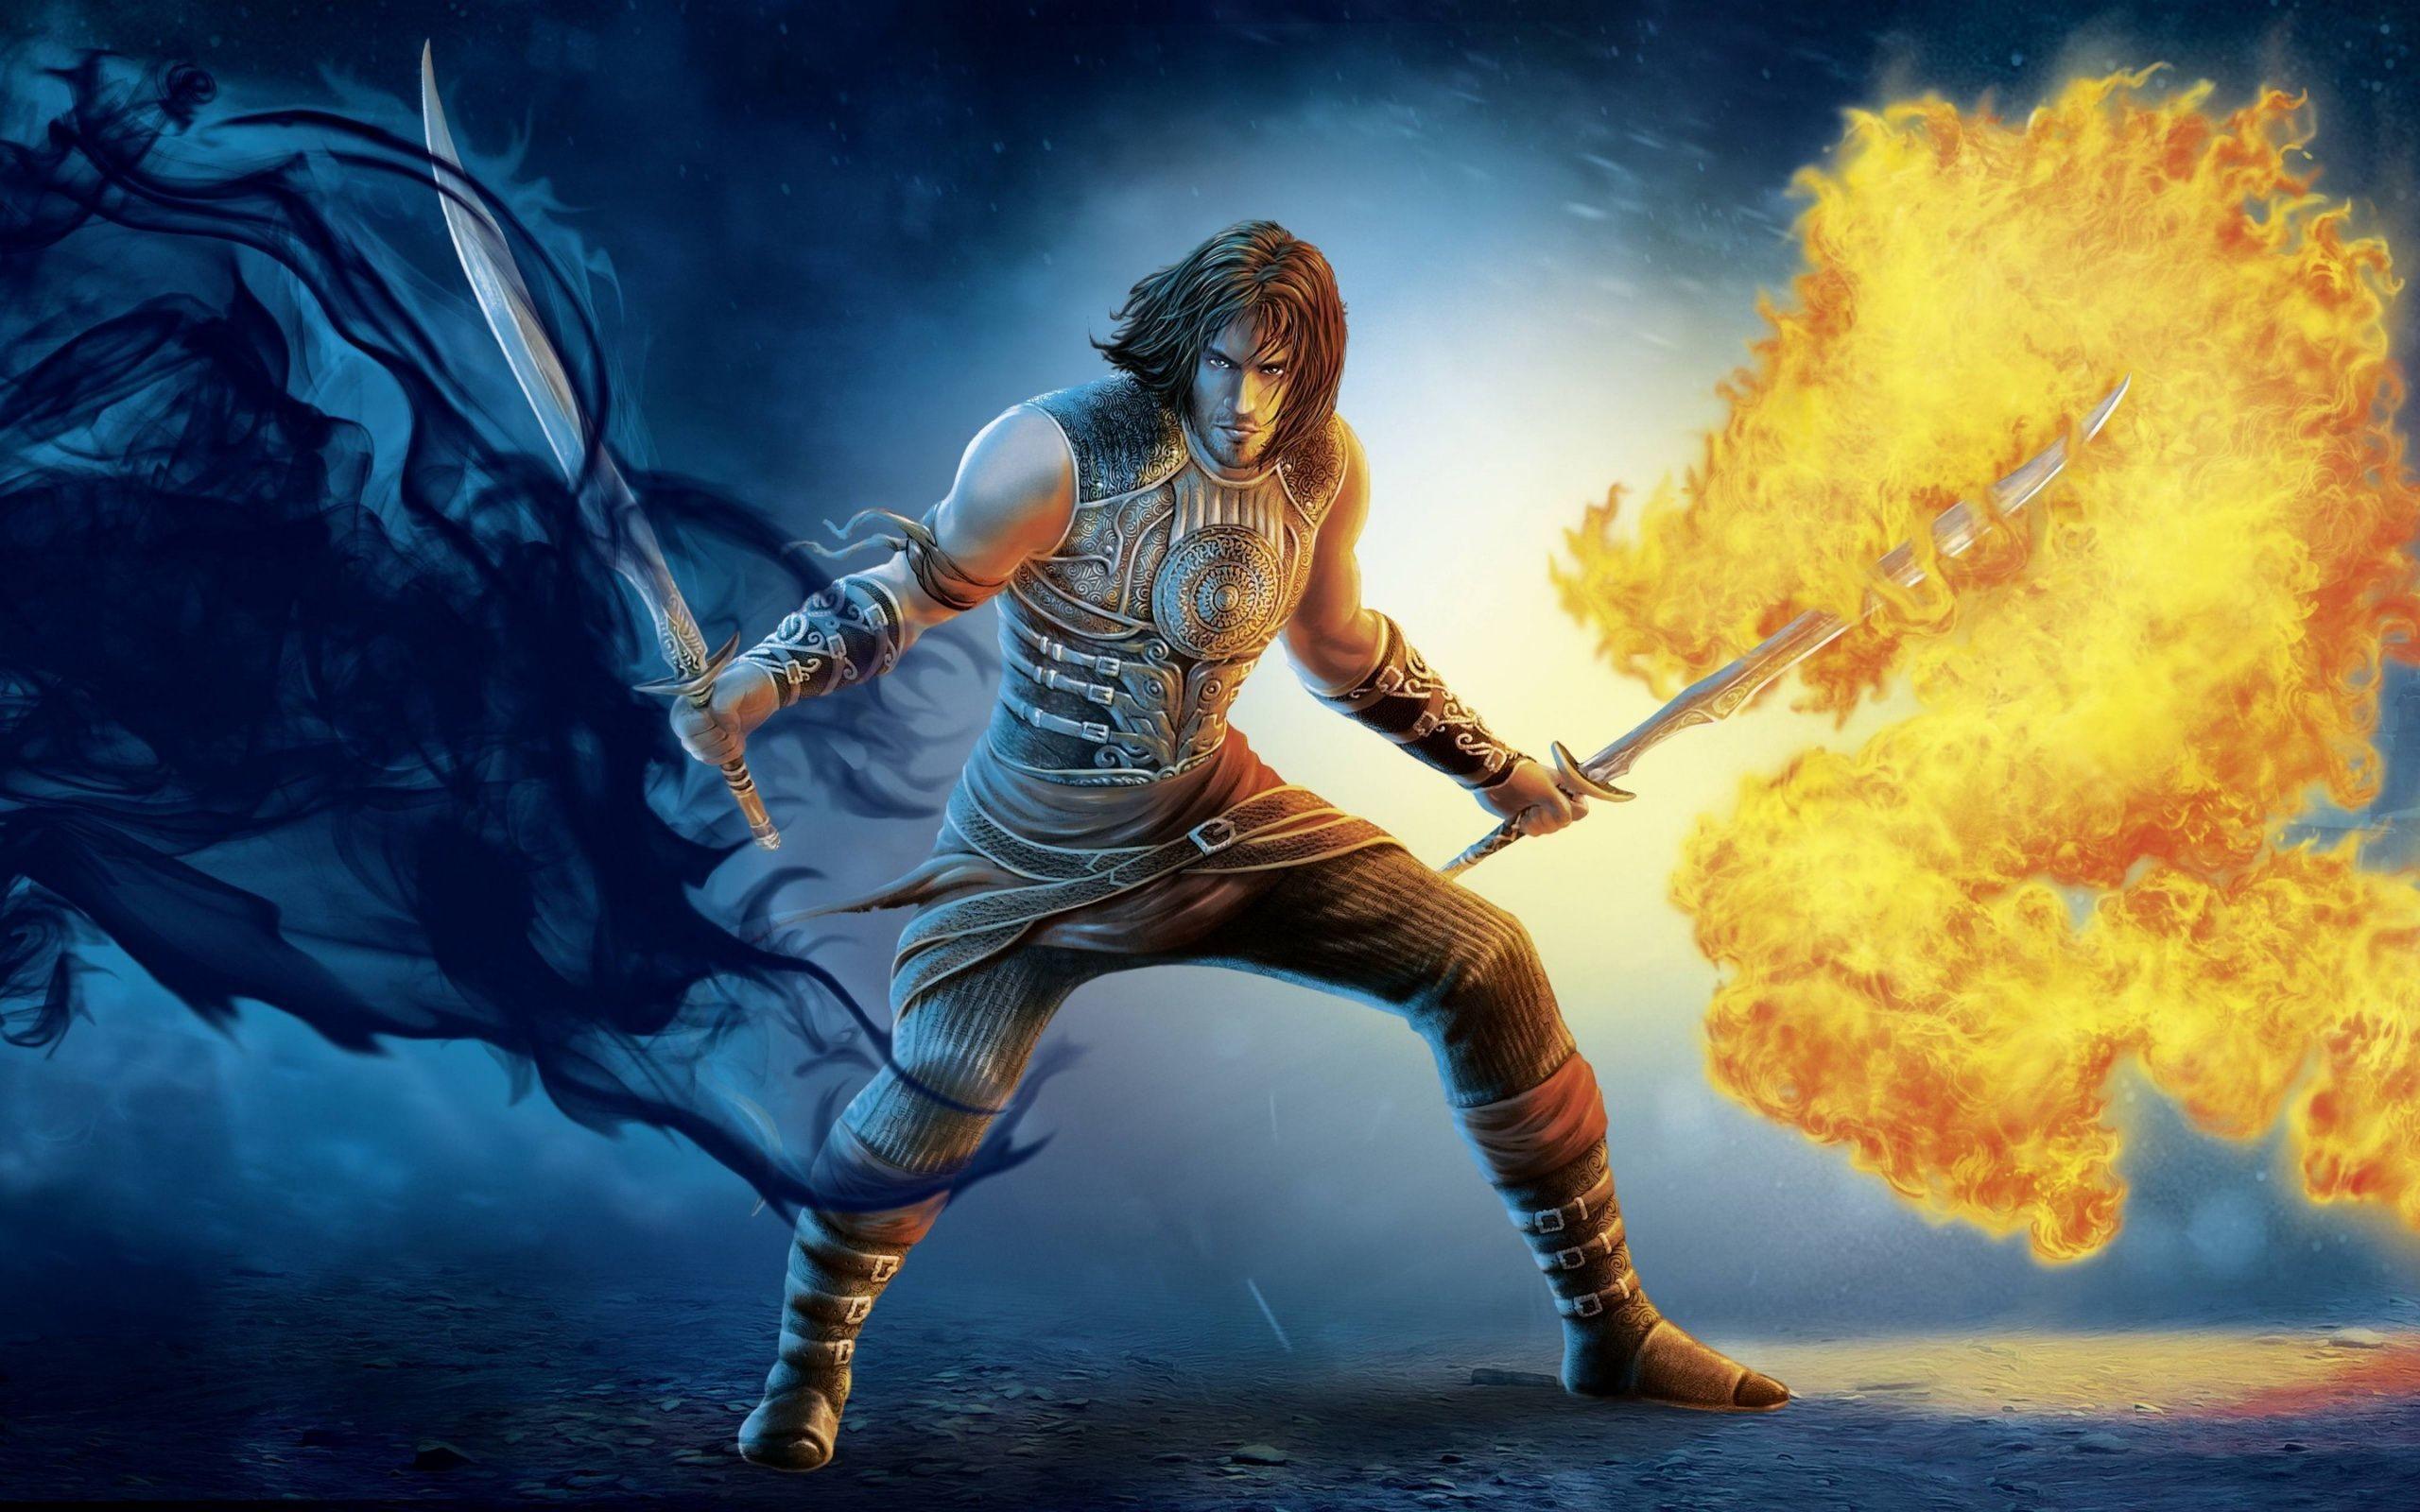 … Prince of Persia HD Wallpaper 2560×1600